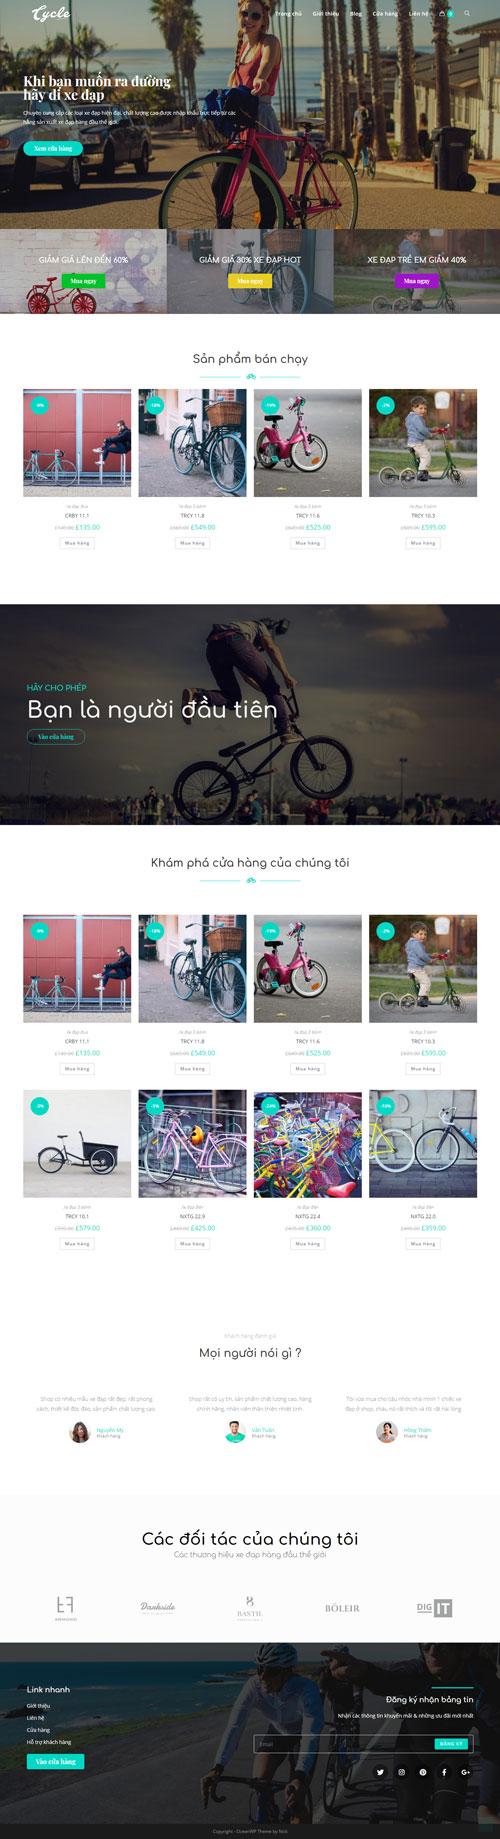 Website kinh doanh xe đạp 1